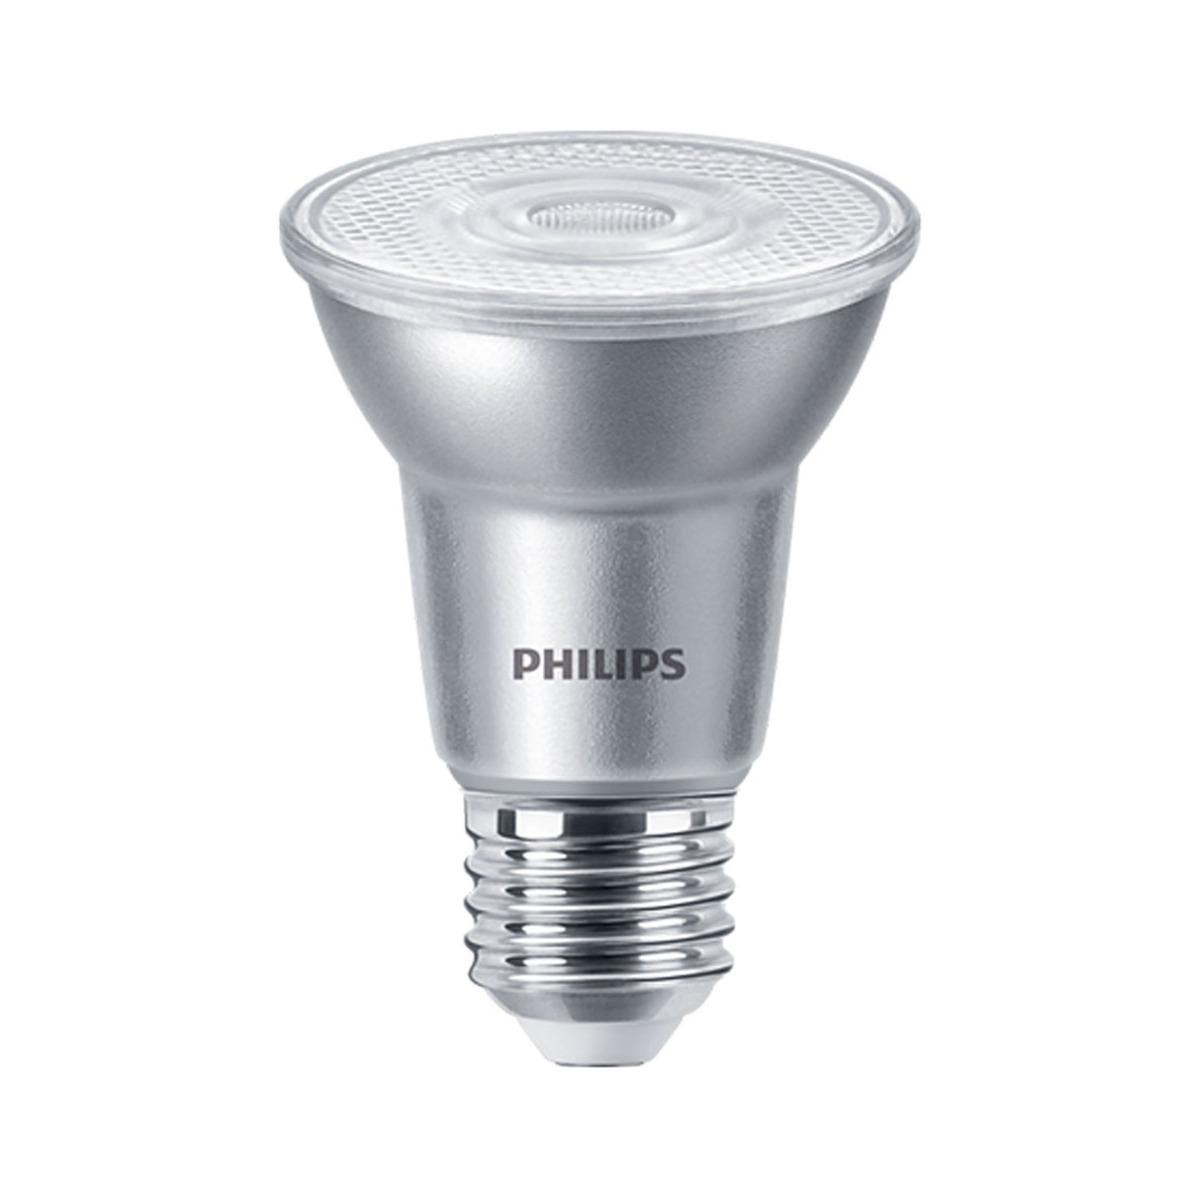 Philips LEDspot E27 PAR20 6W 830 40D 515lm (MASTER) | Dimbaar - Warm Wit - Vervangt 50W